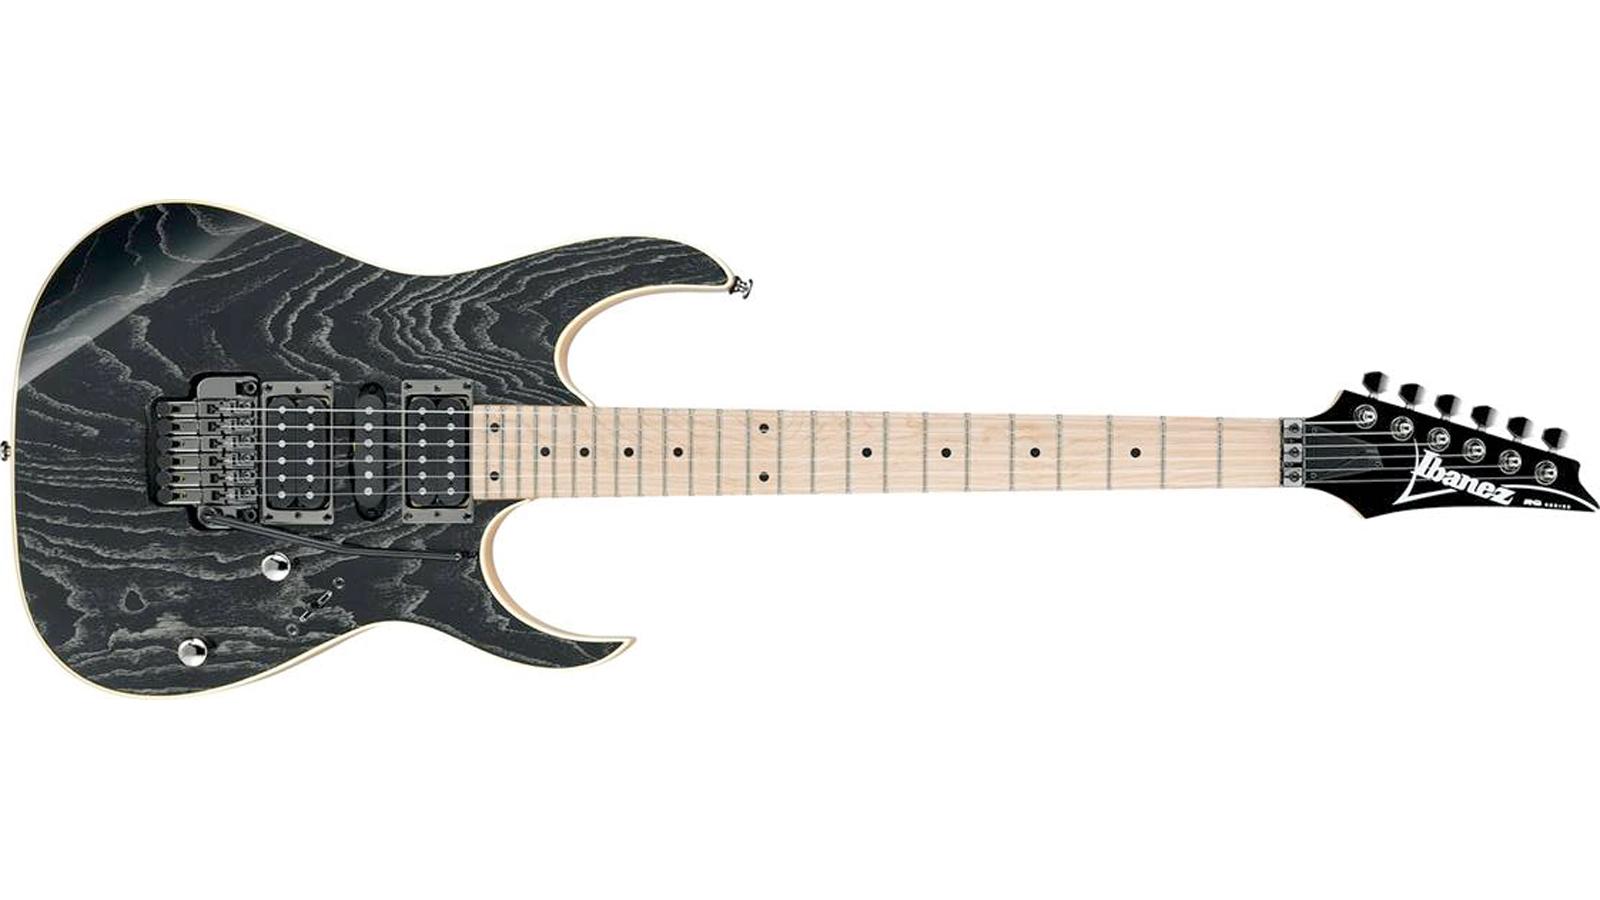 Ibanez RG370AHMZ-SWK E-Gitarre